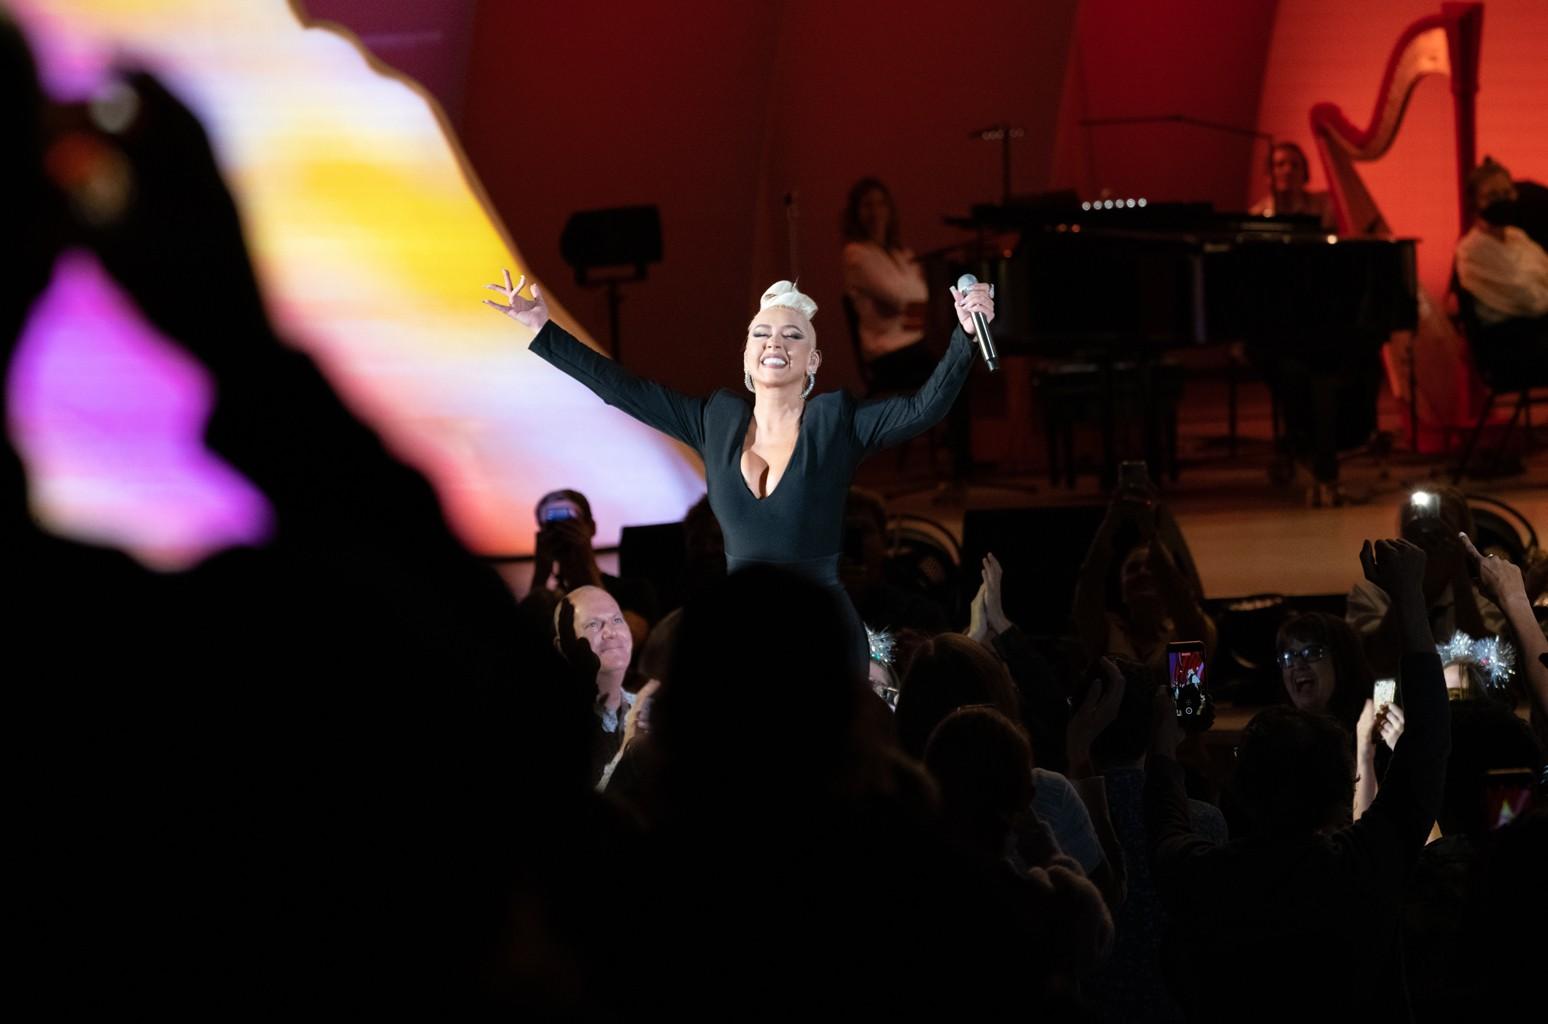 My First Show Back: Christina Aguilera at Hollywood Bowl